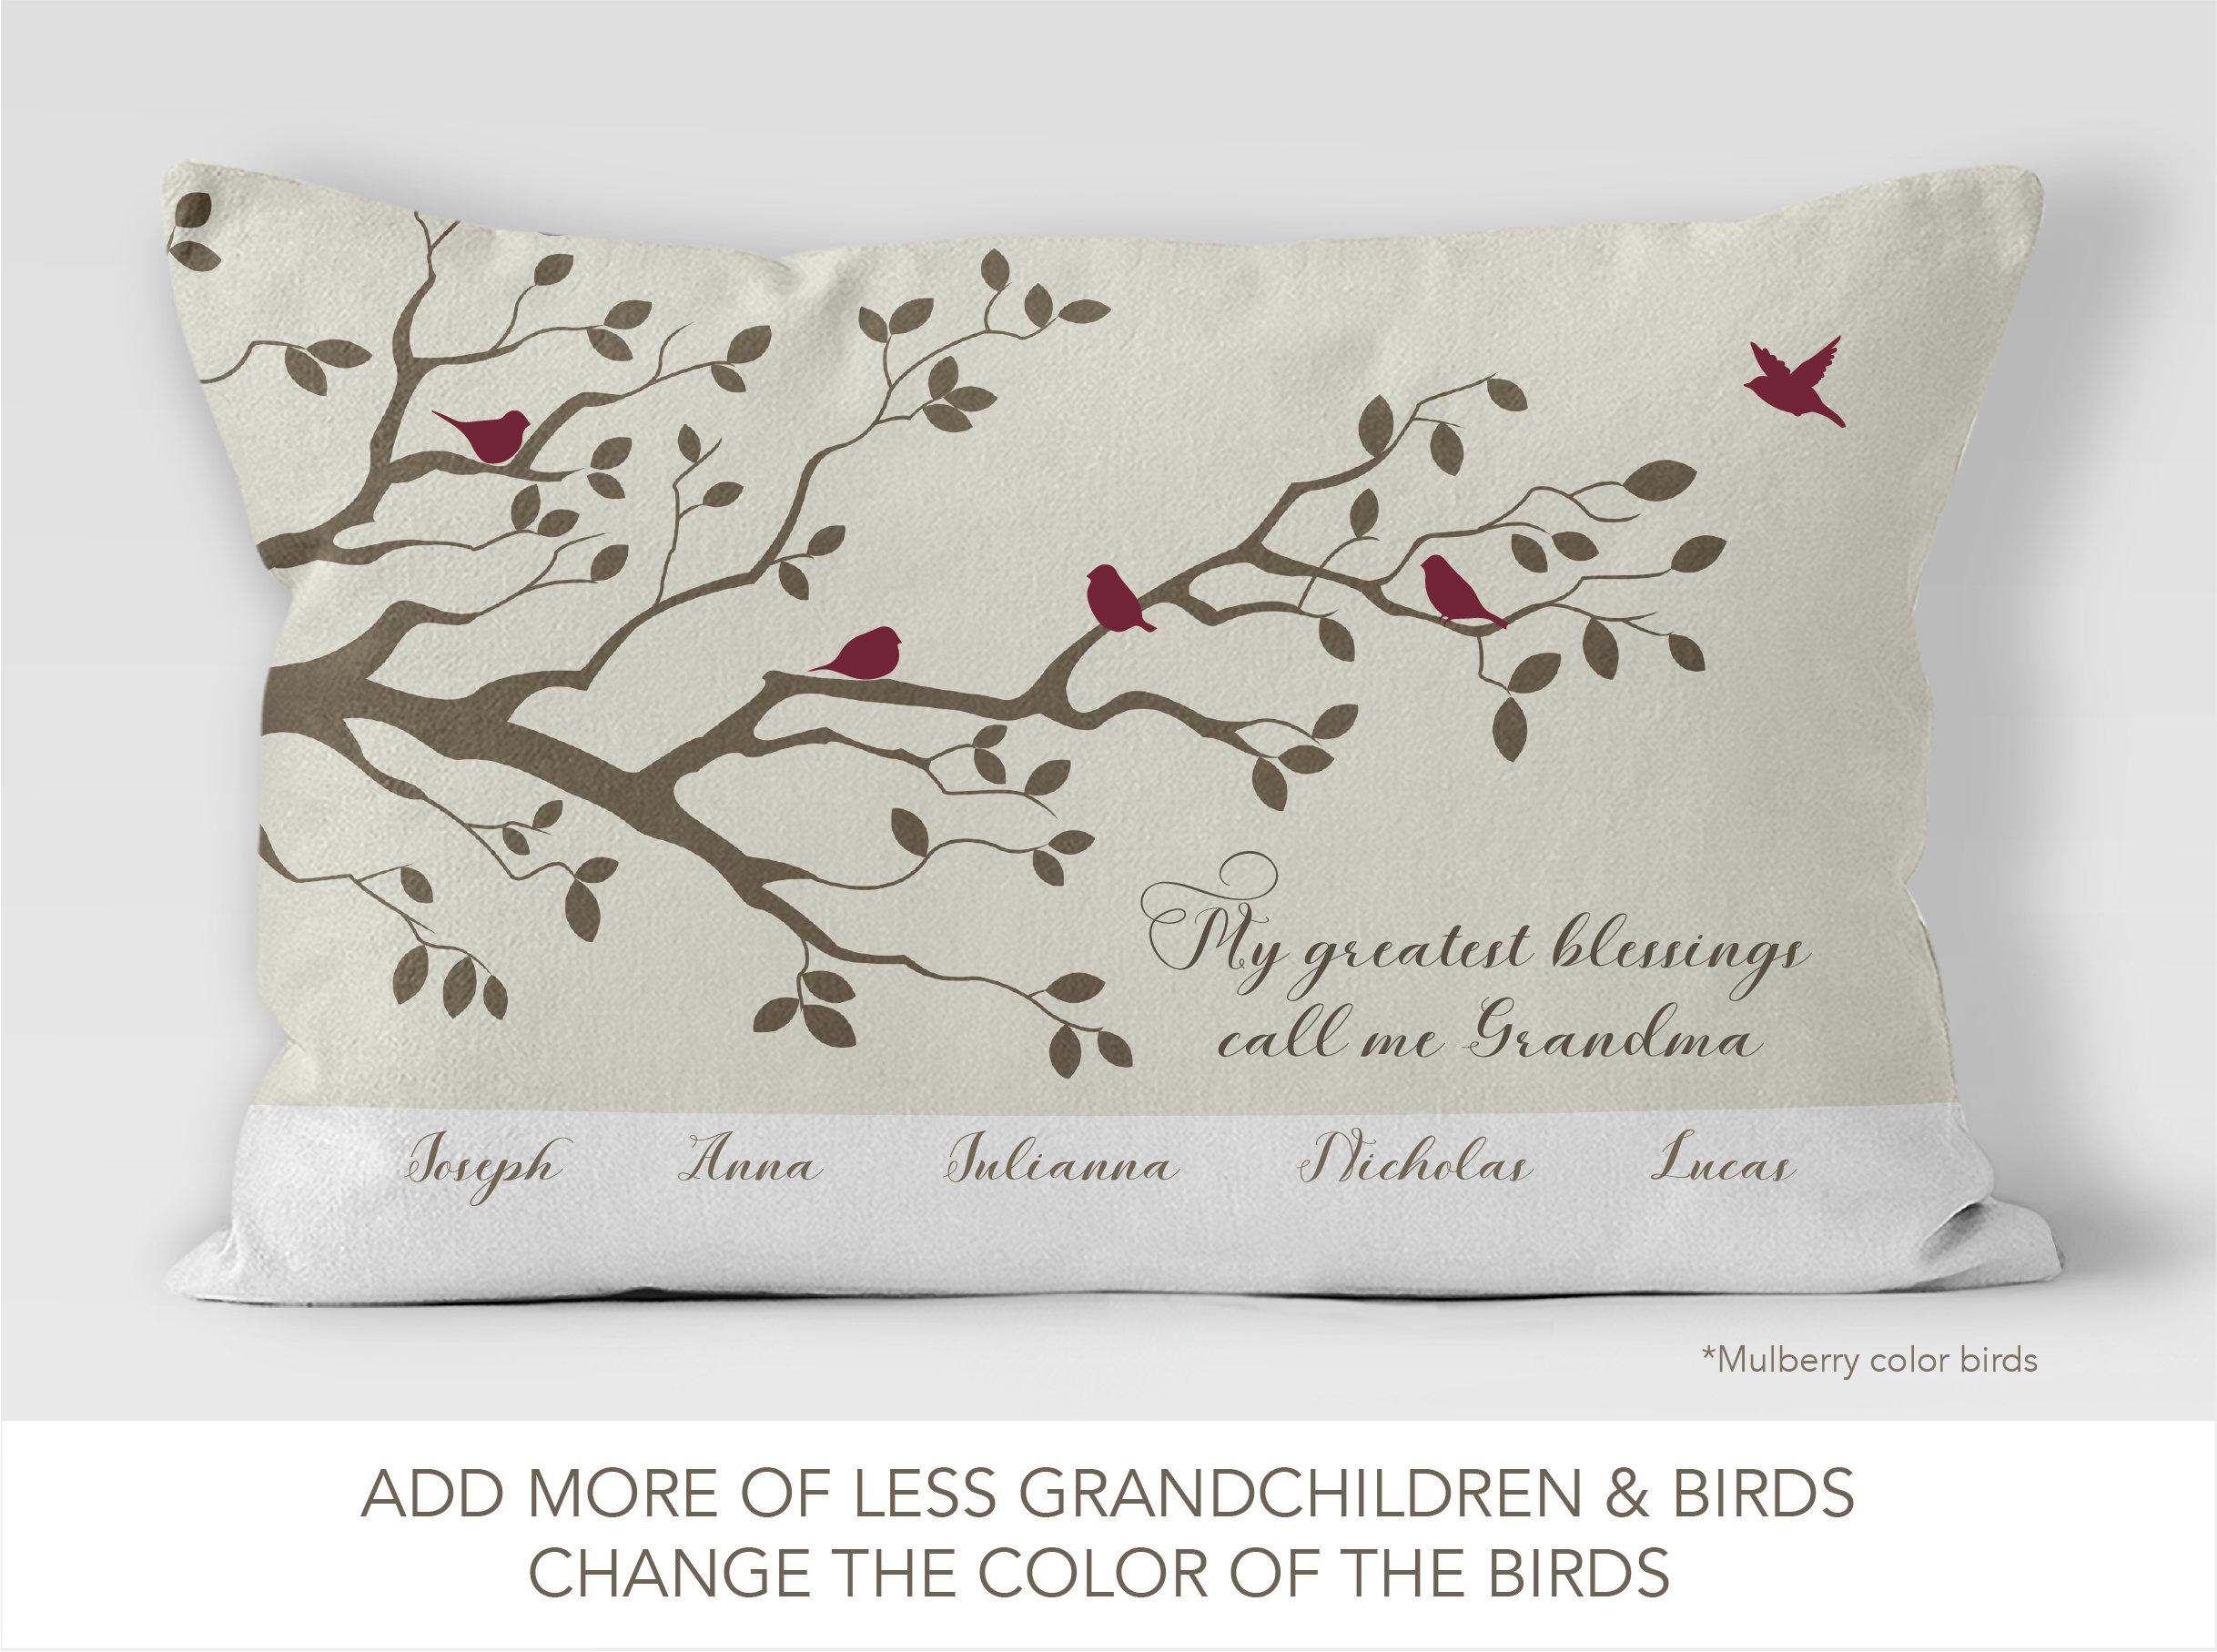 grandchildren zoom call me pillow grandma il personalized listing pillows fullxfull